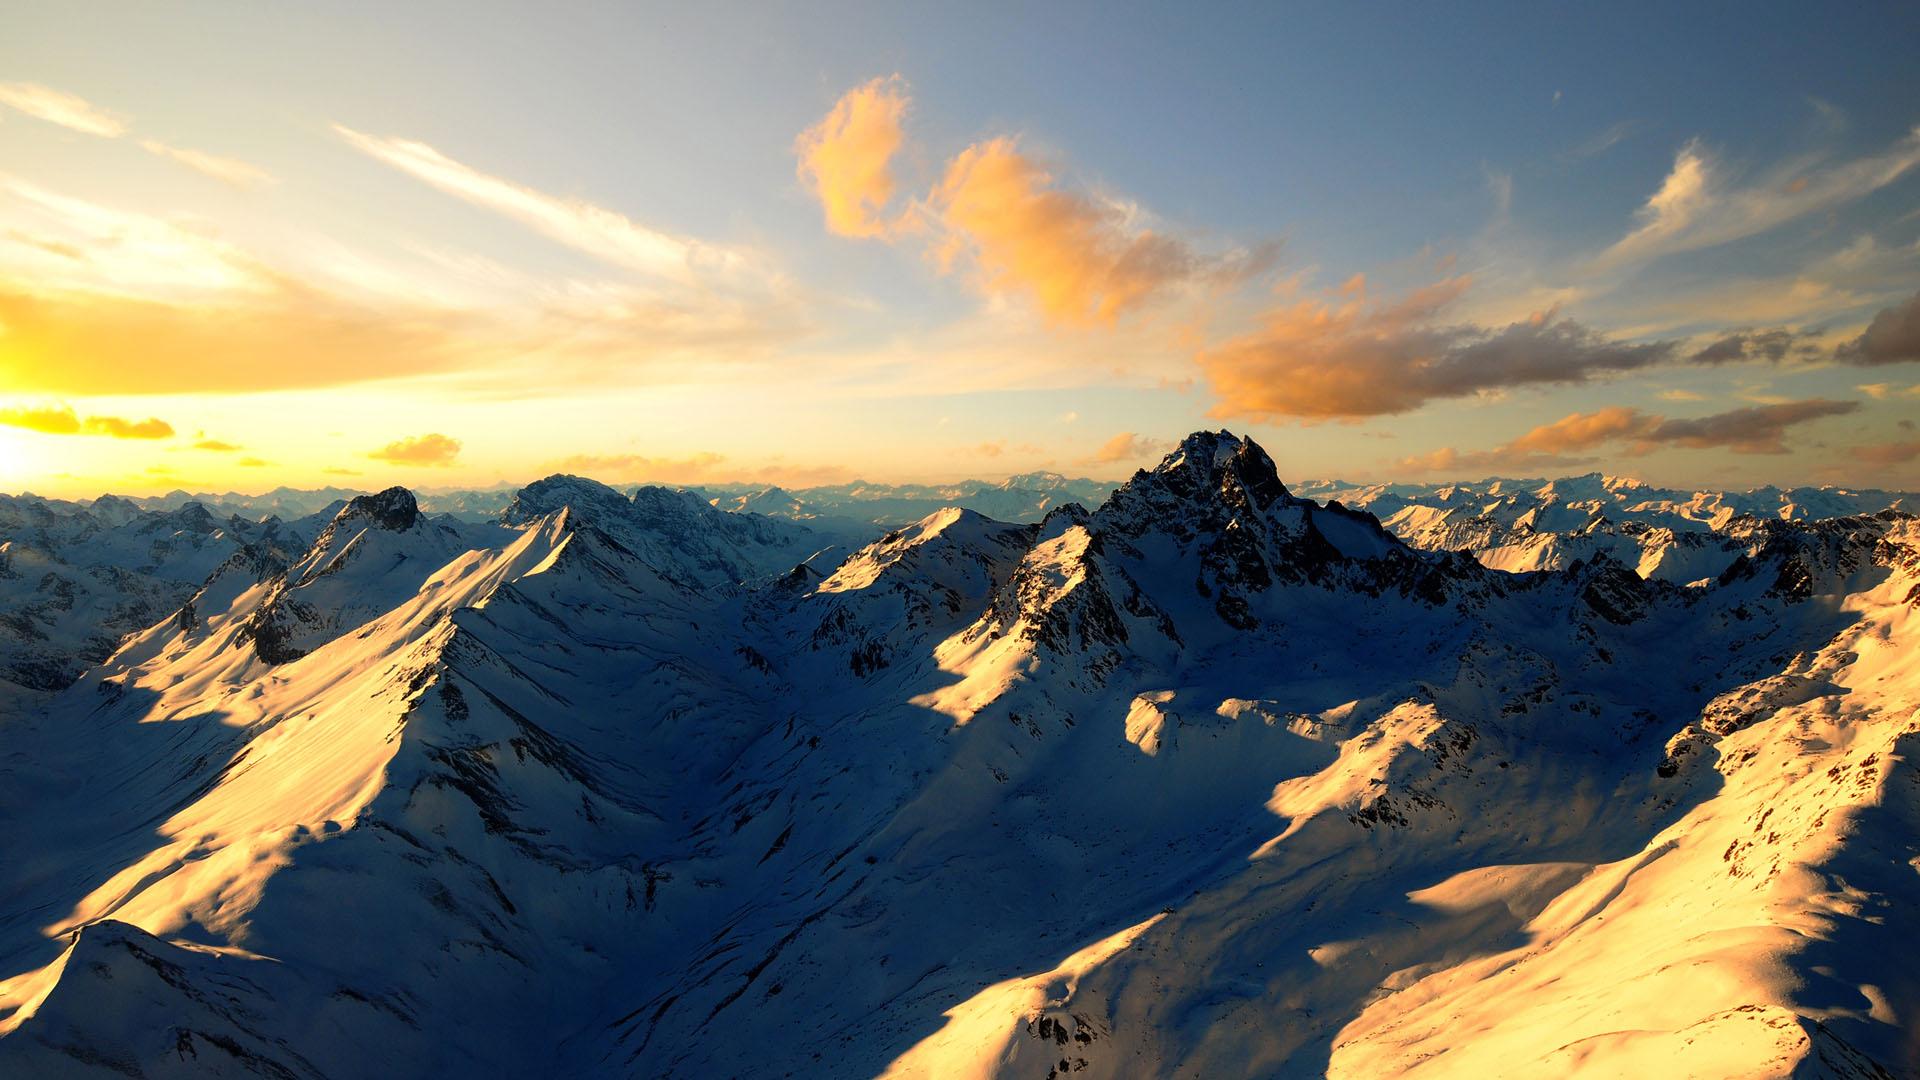 Free-Desktop-Backgrounds-Snow-Mountain-wallpaper-wpc9005196